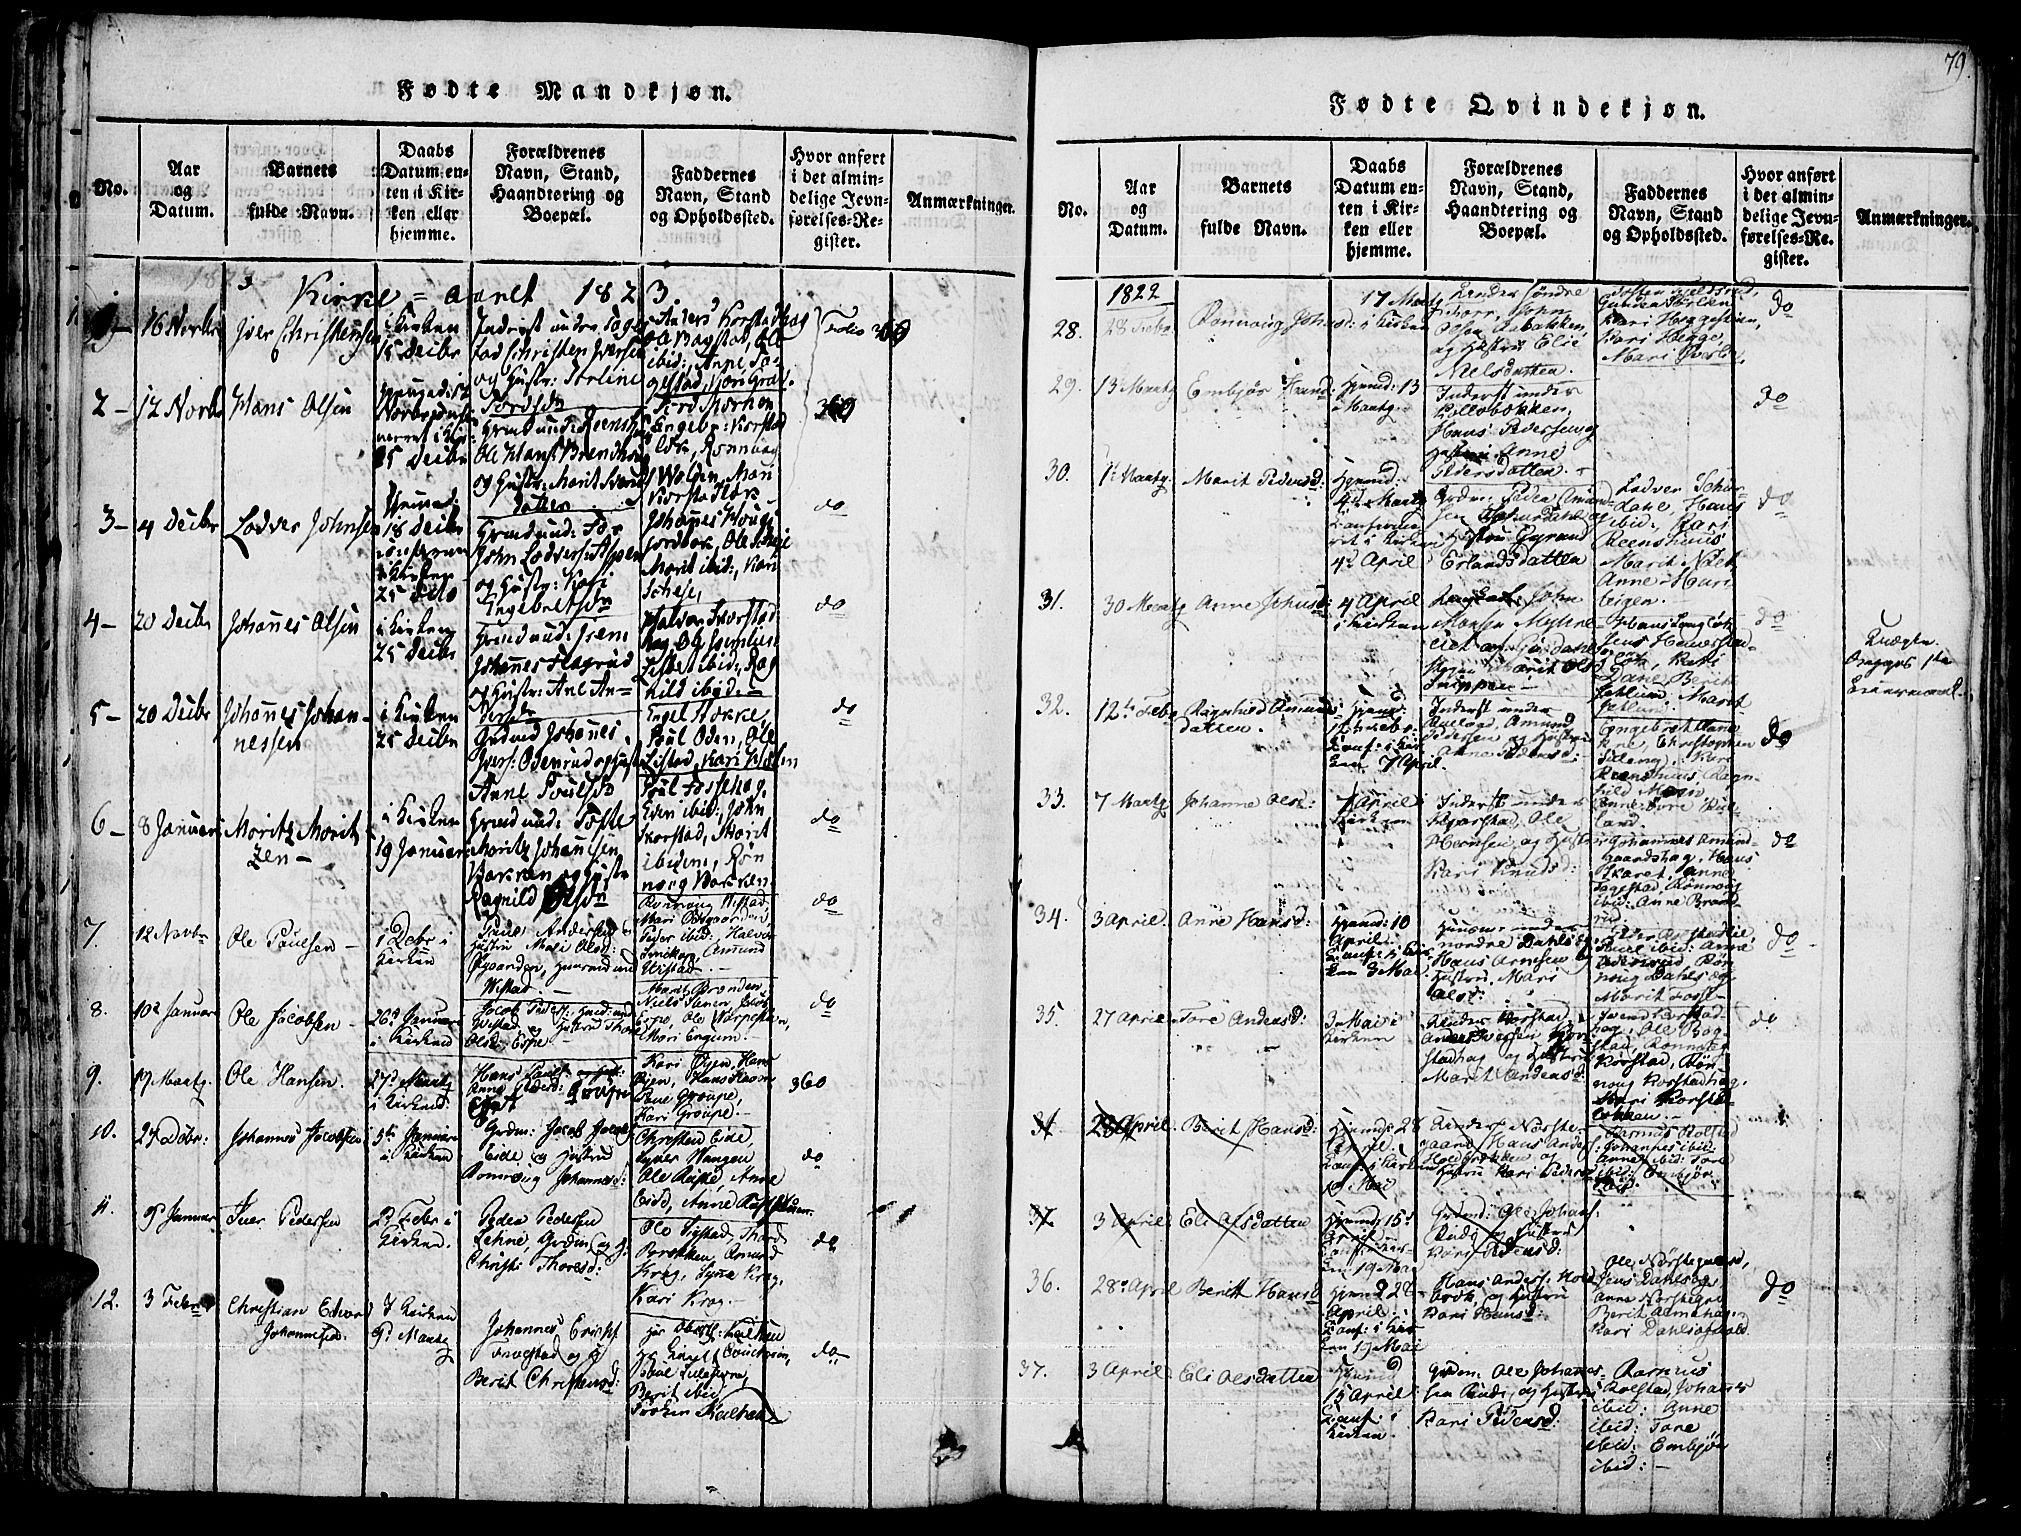 SAH, Fron prestekontor, H/Ha/Haa/L0002: Ministerialbok nr. 2, 1816-1827, s. 79